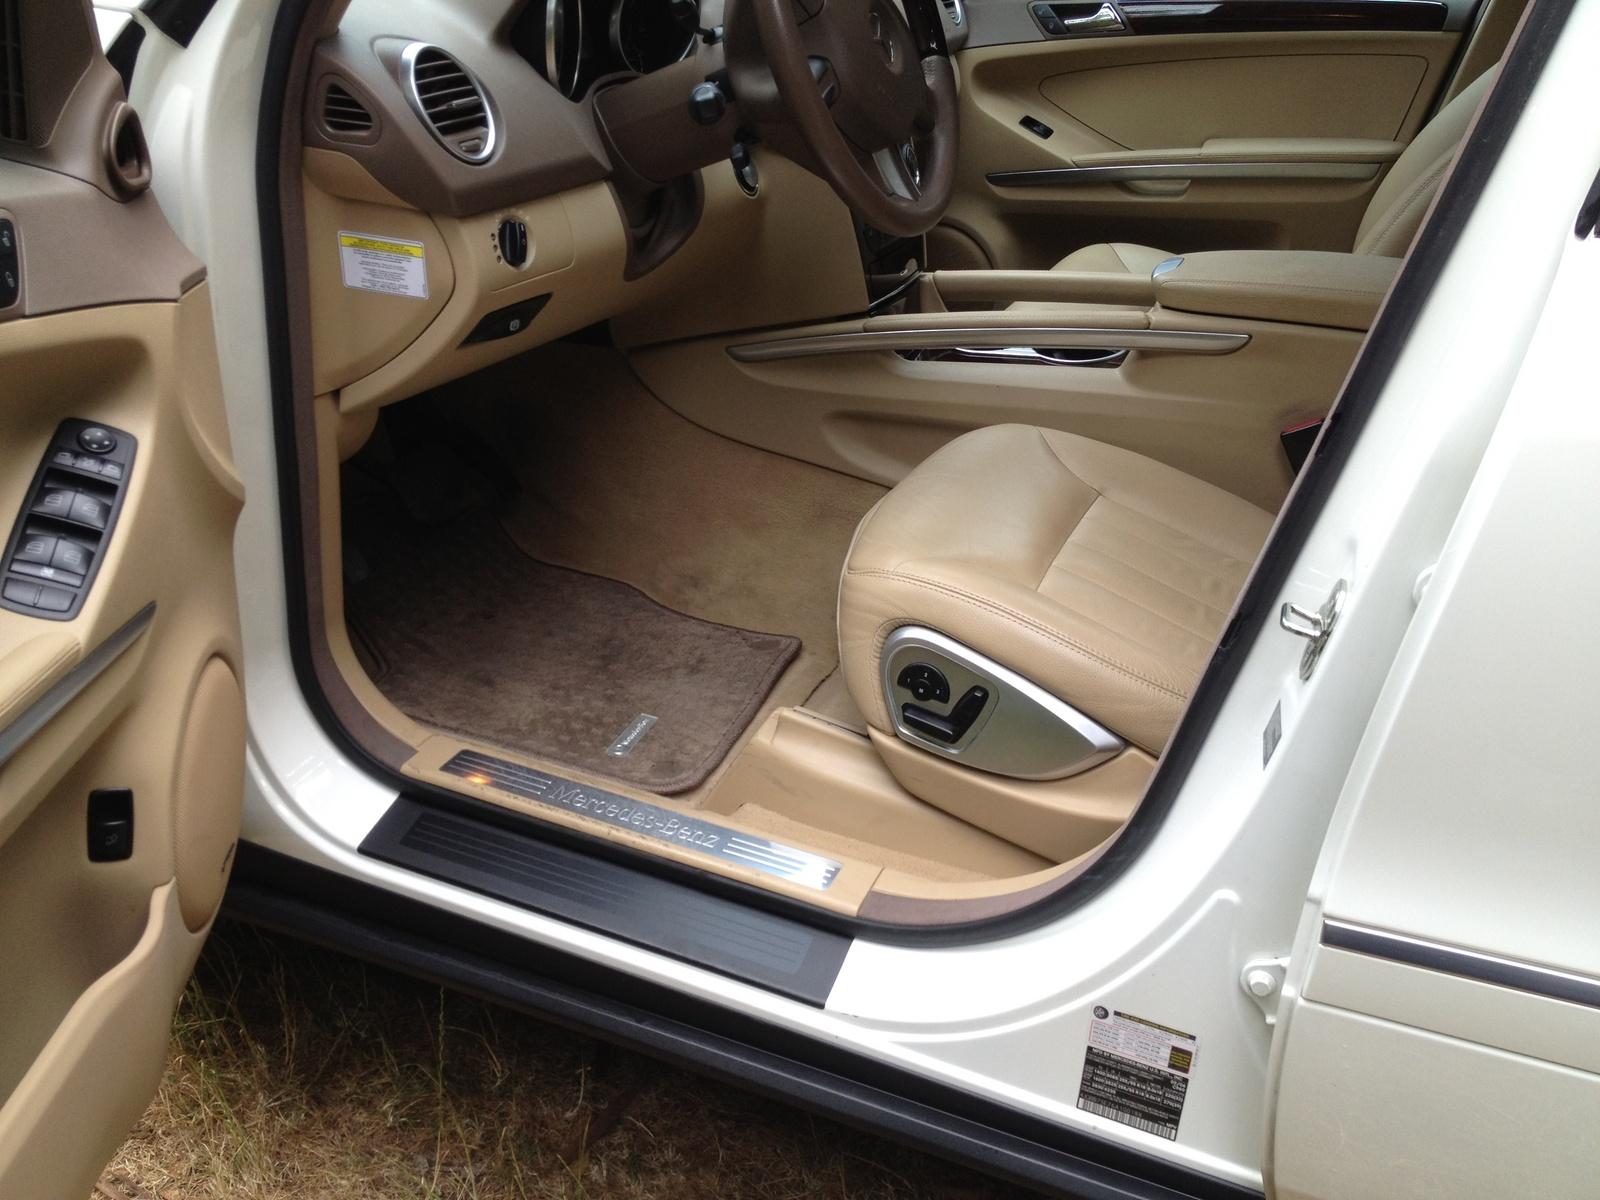 2012 mercedes benz ml500 price for Mercedes benz 2006 ml500 price